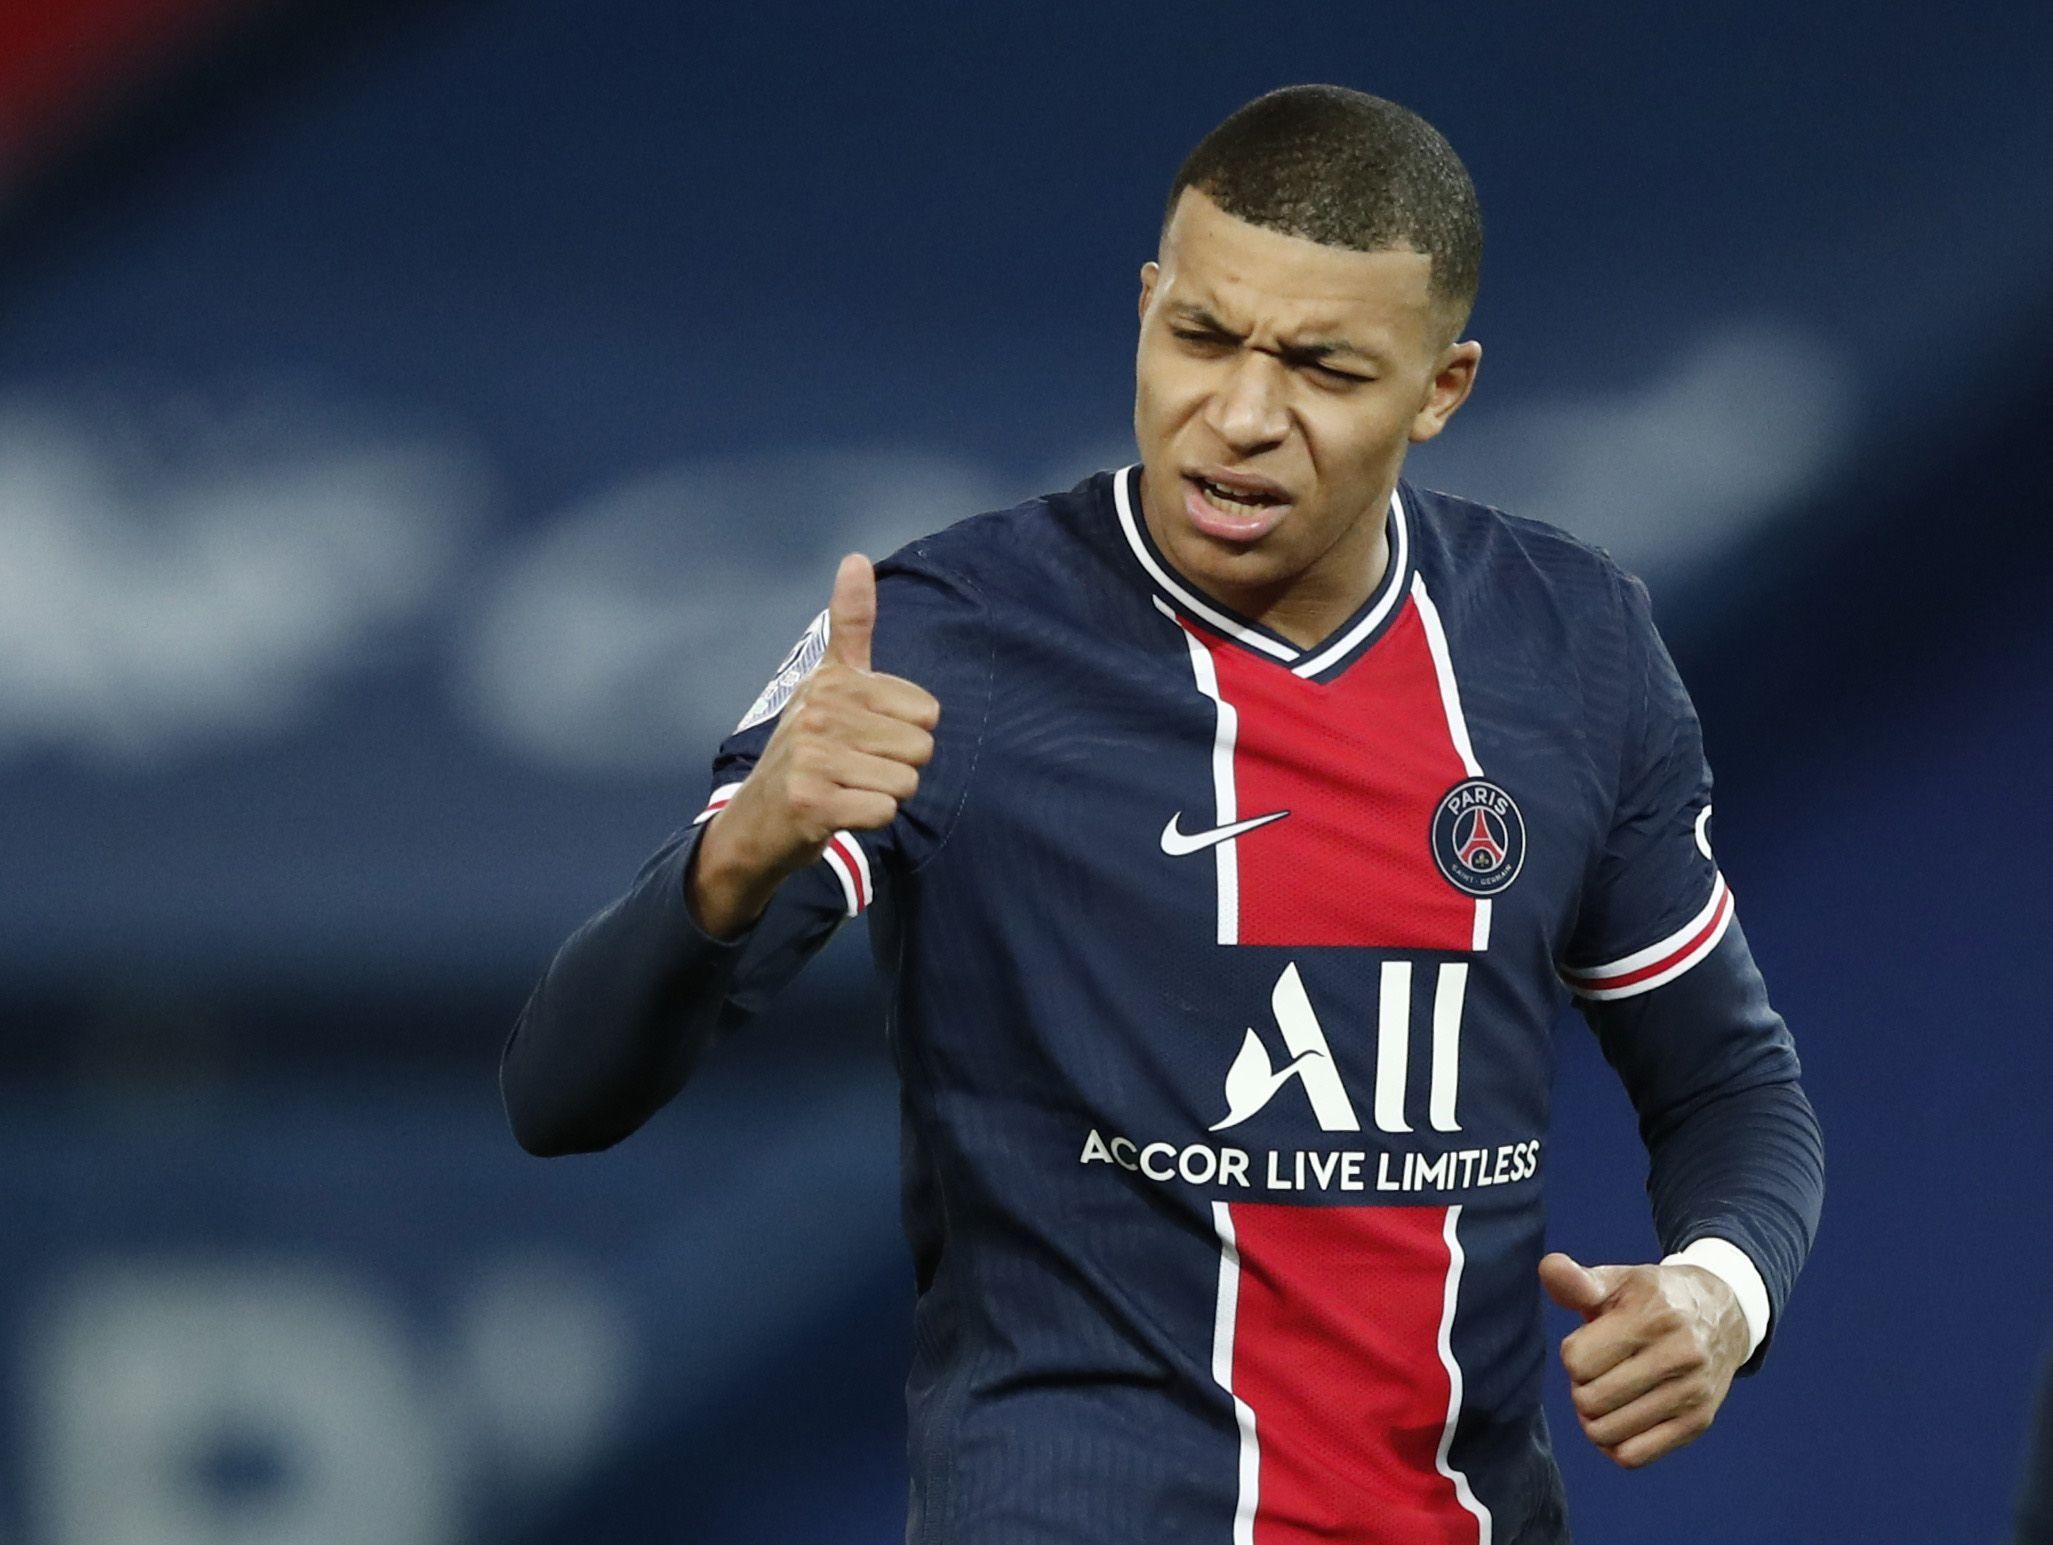 Kylian Mbappé es una de las grandes figuras del PSG (REUTERS/Benoit Tessier)